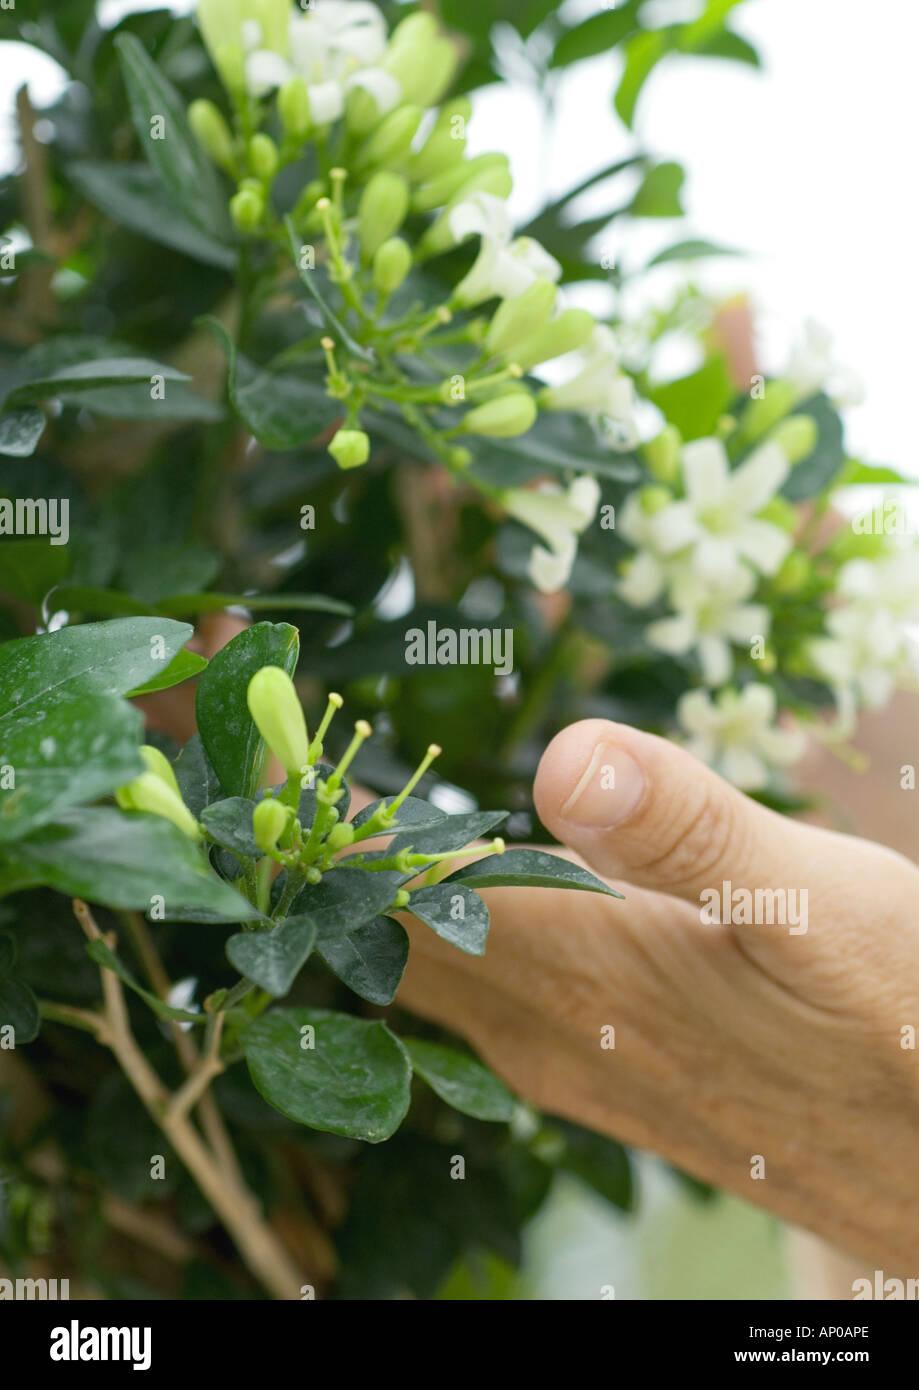 Hand touching jasmine plant - Stock Image